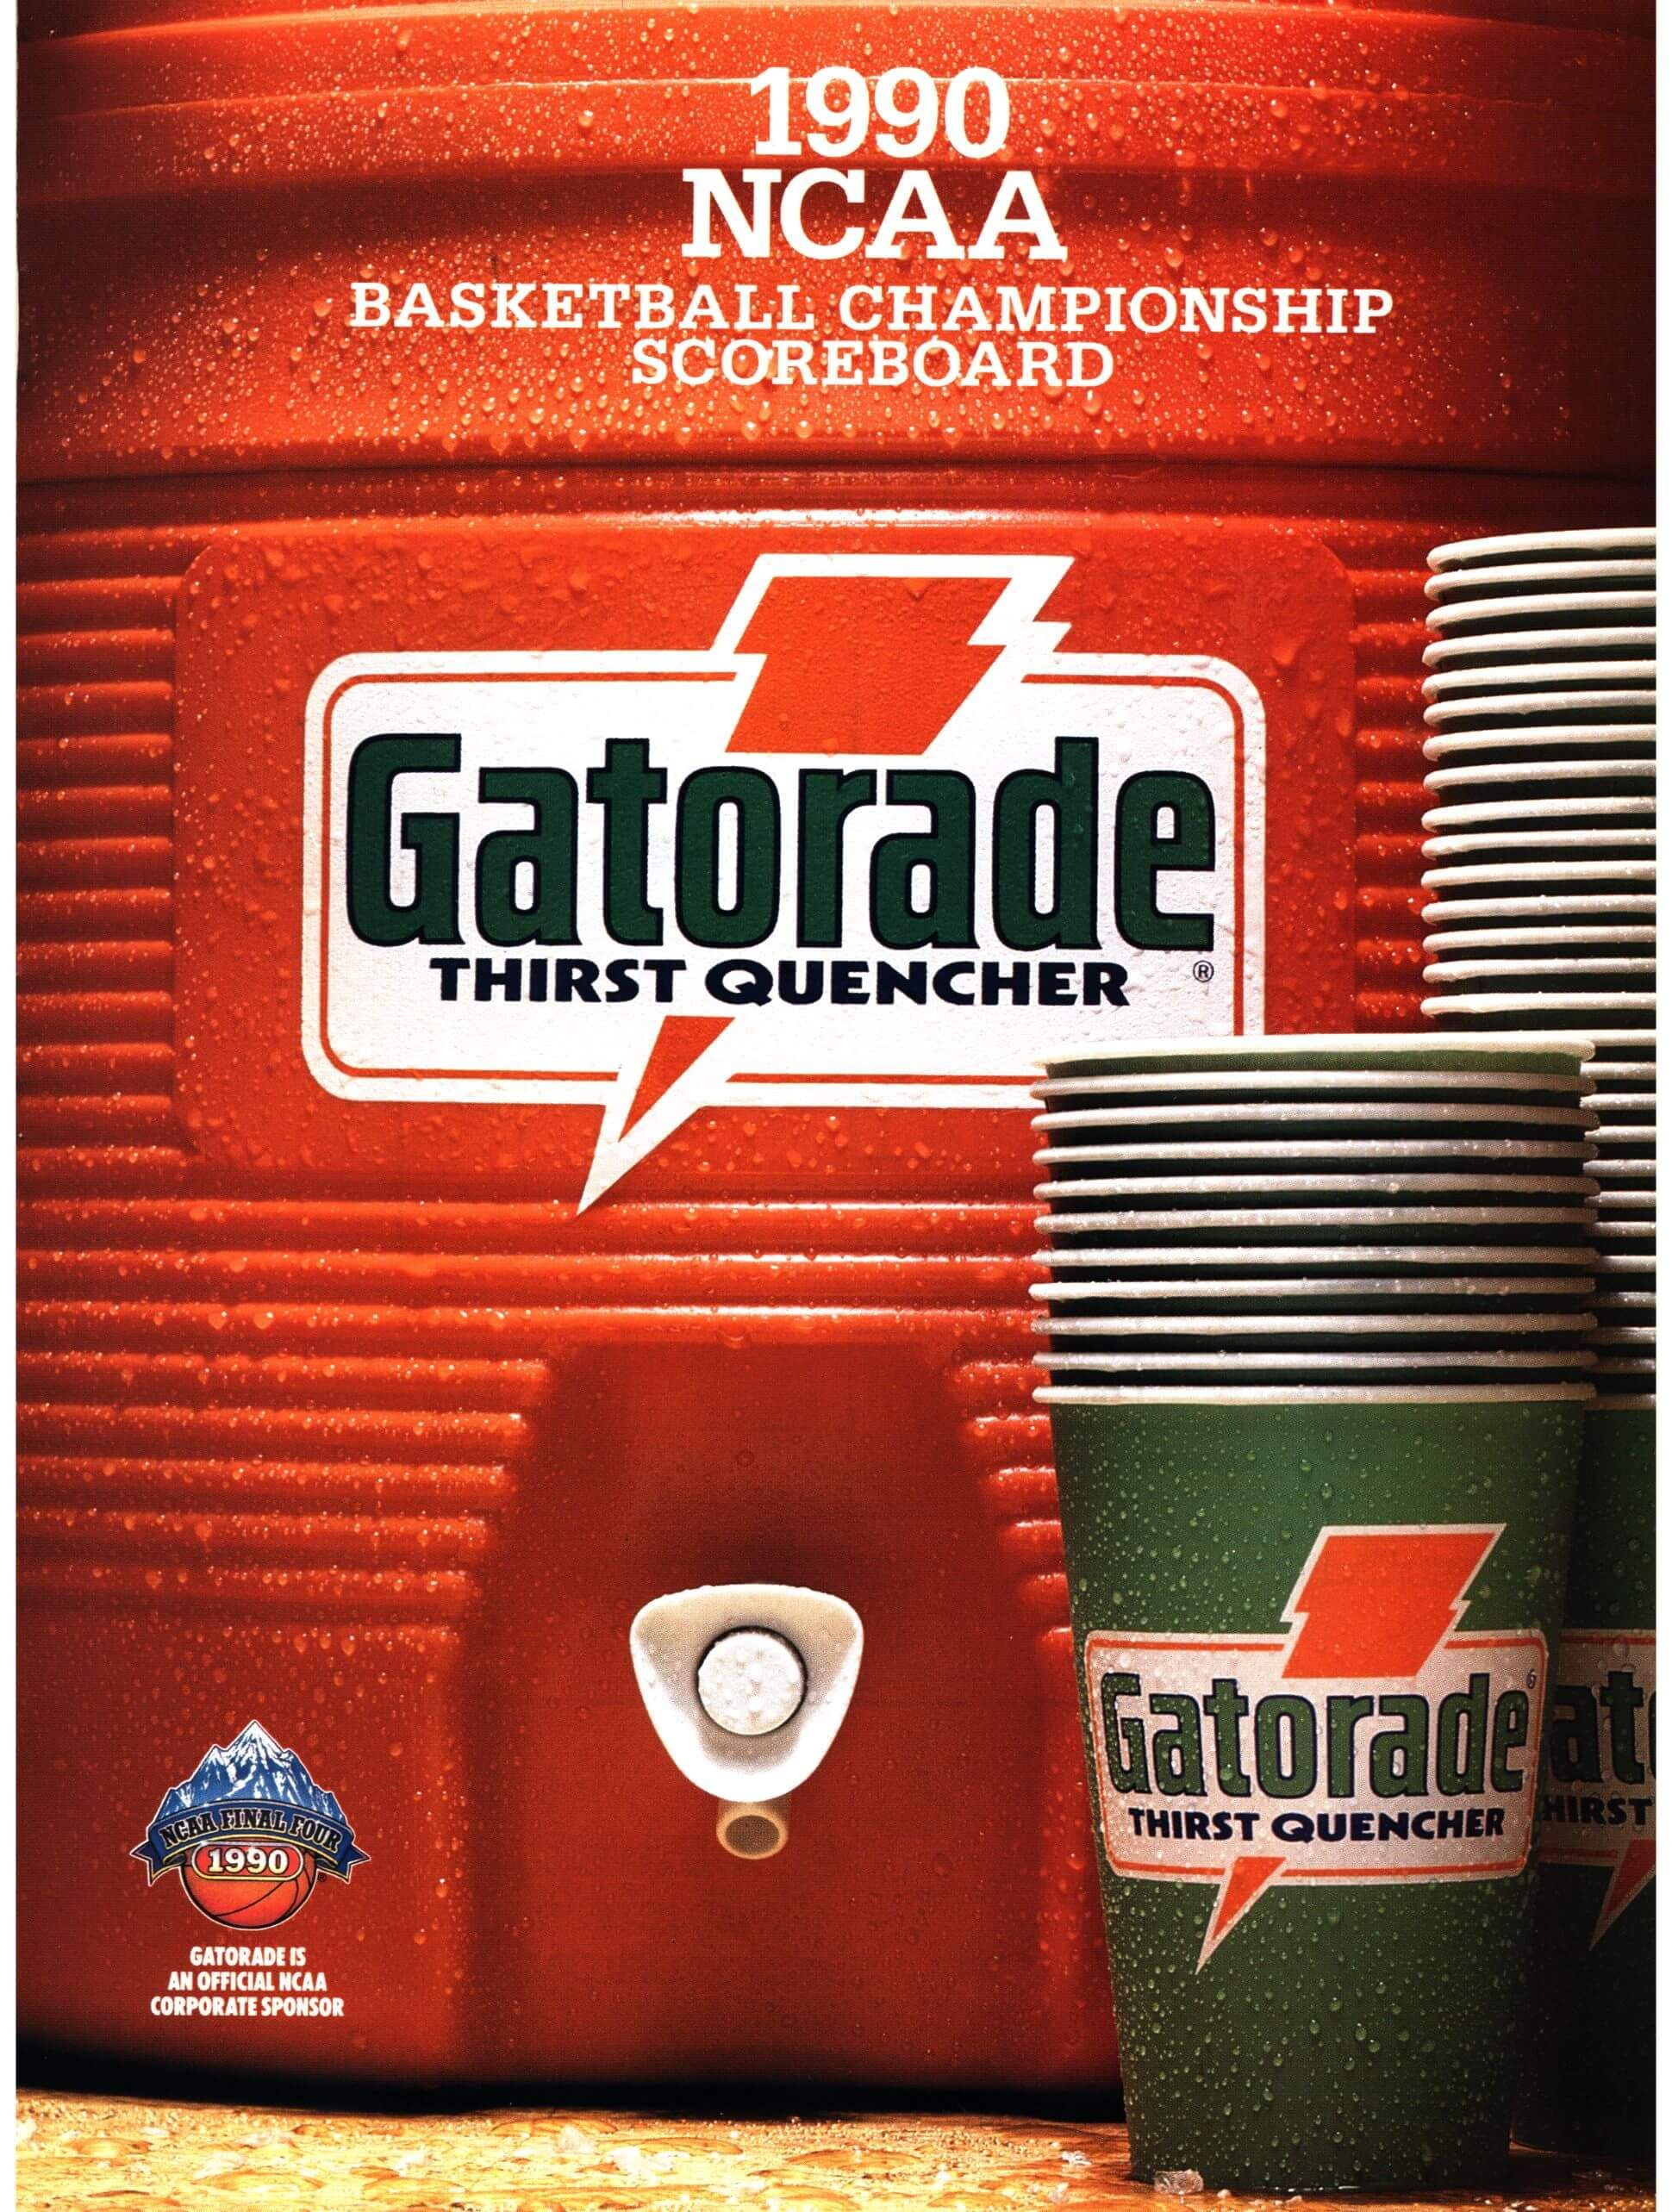 Gatorade 1990 NCCA Championship Ad // Sports Studio Retro